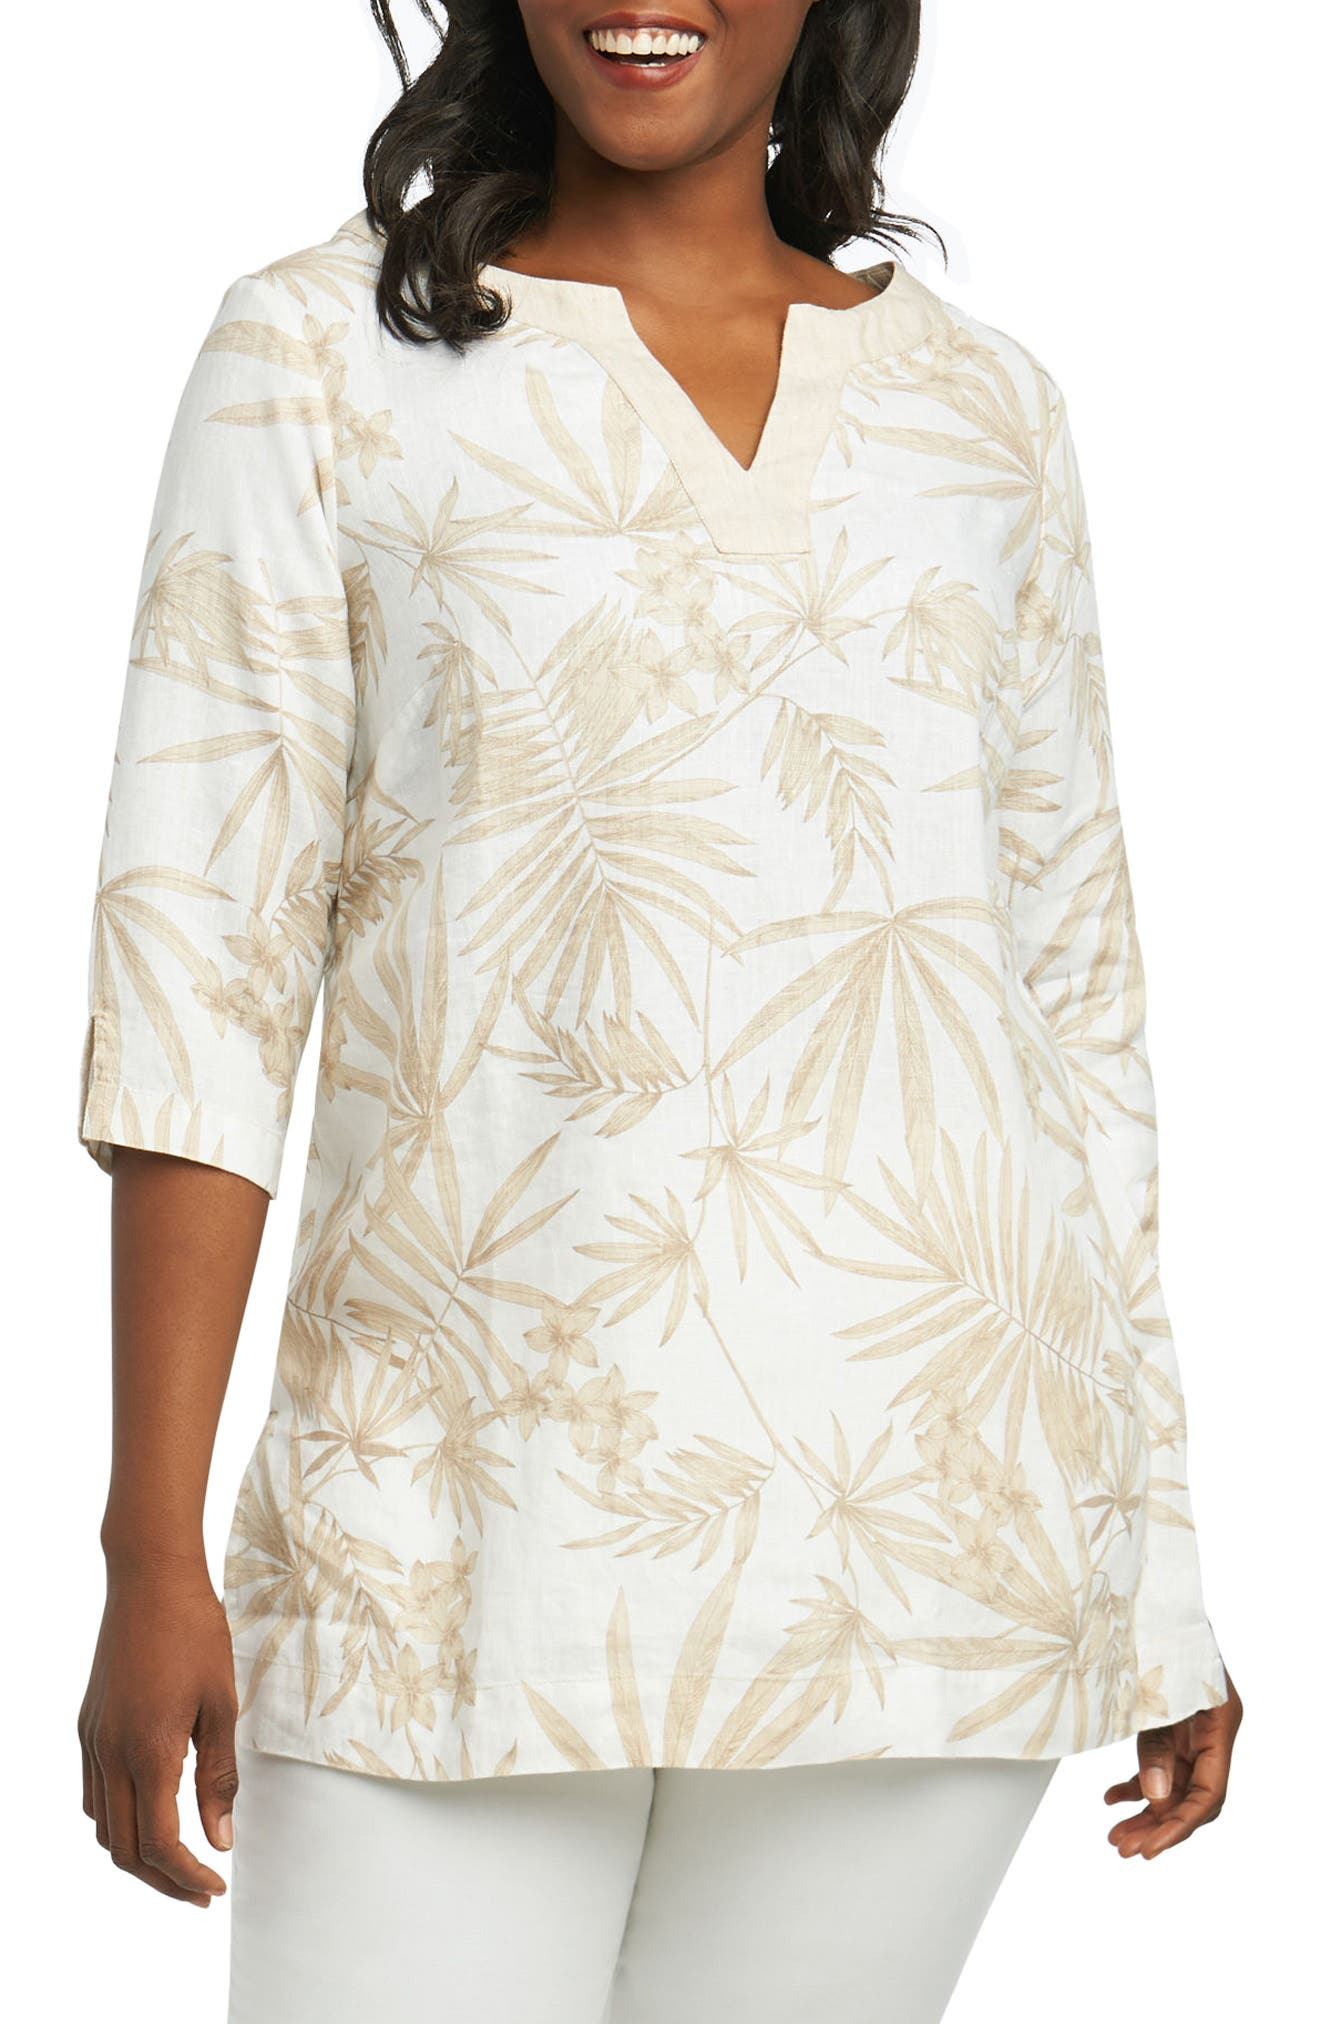 Toni Palm Linen Shirt,                         Main,                         color, Flax